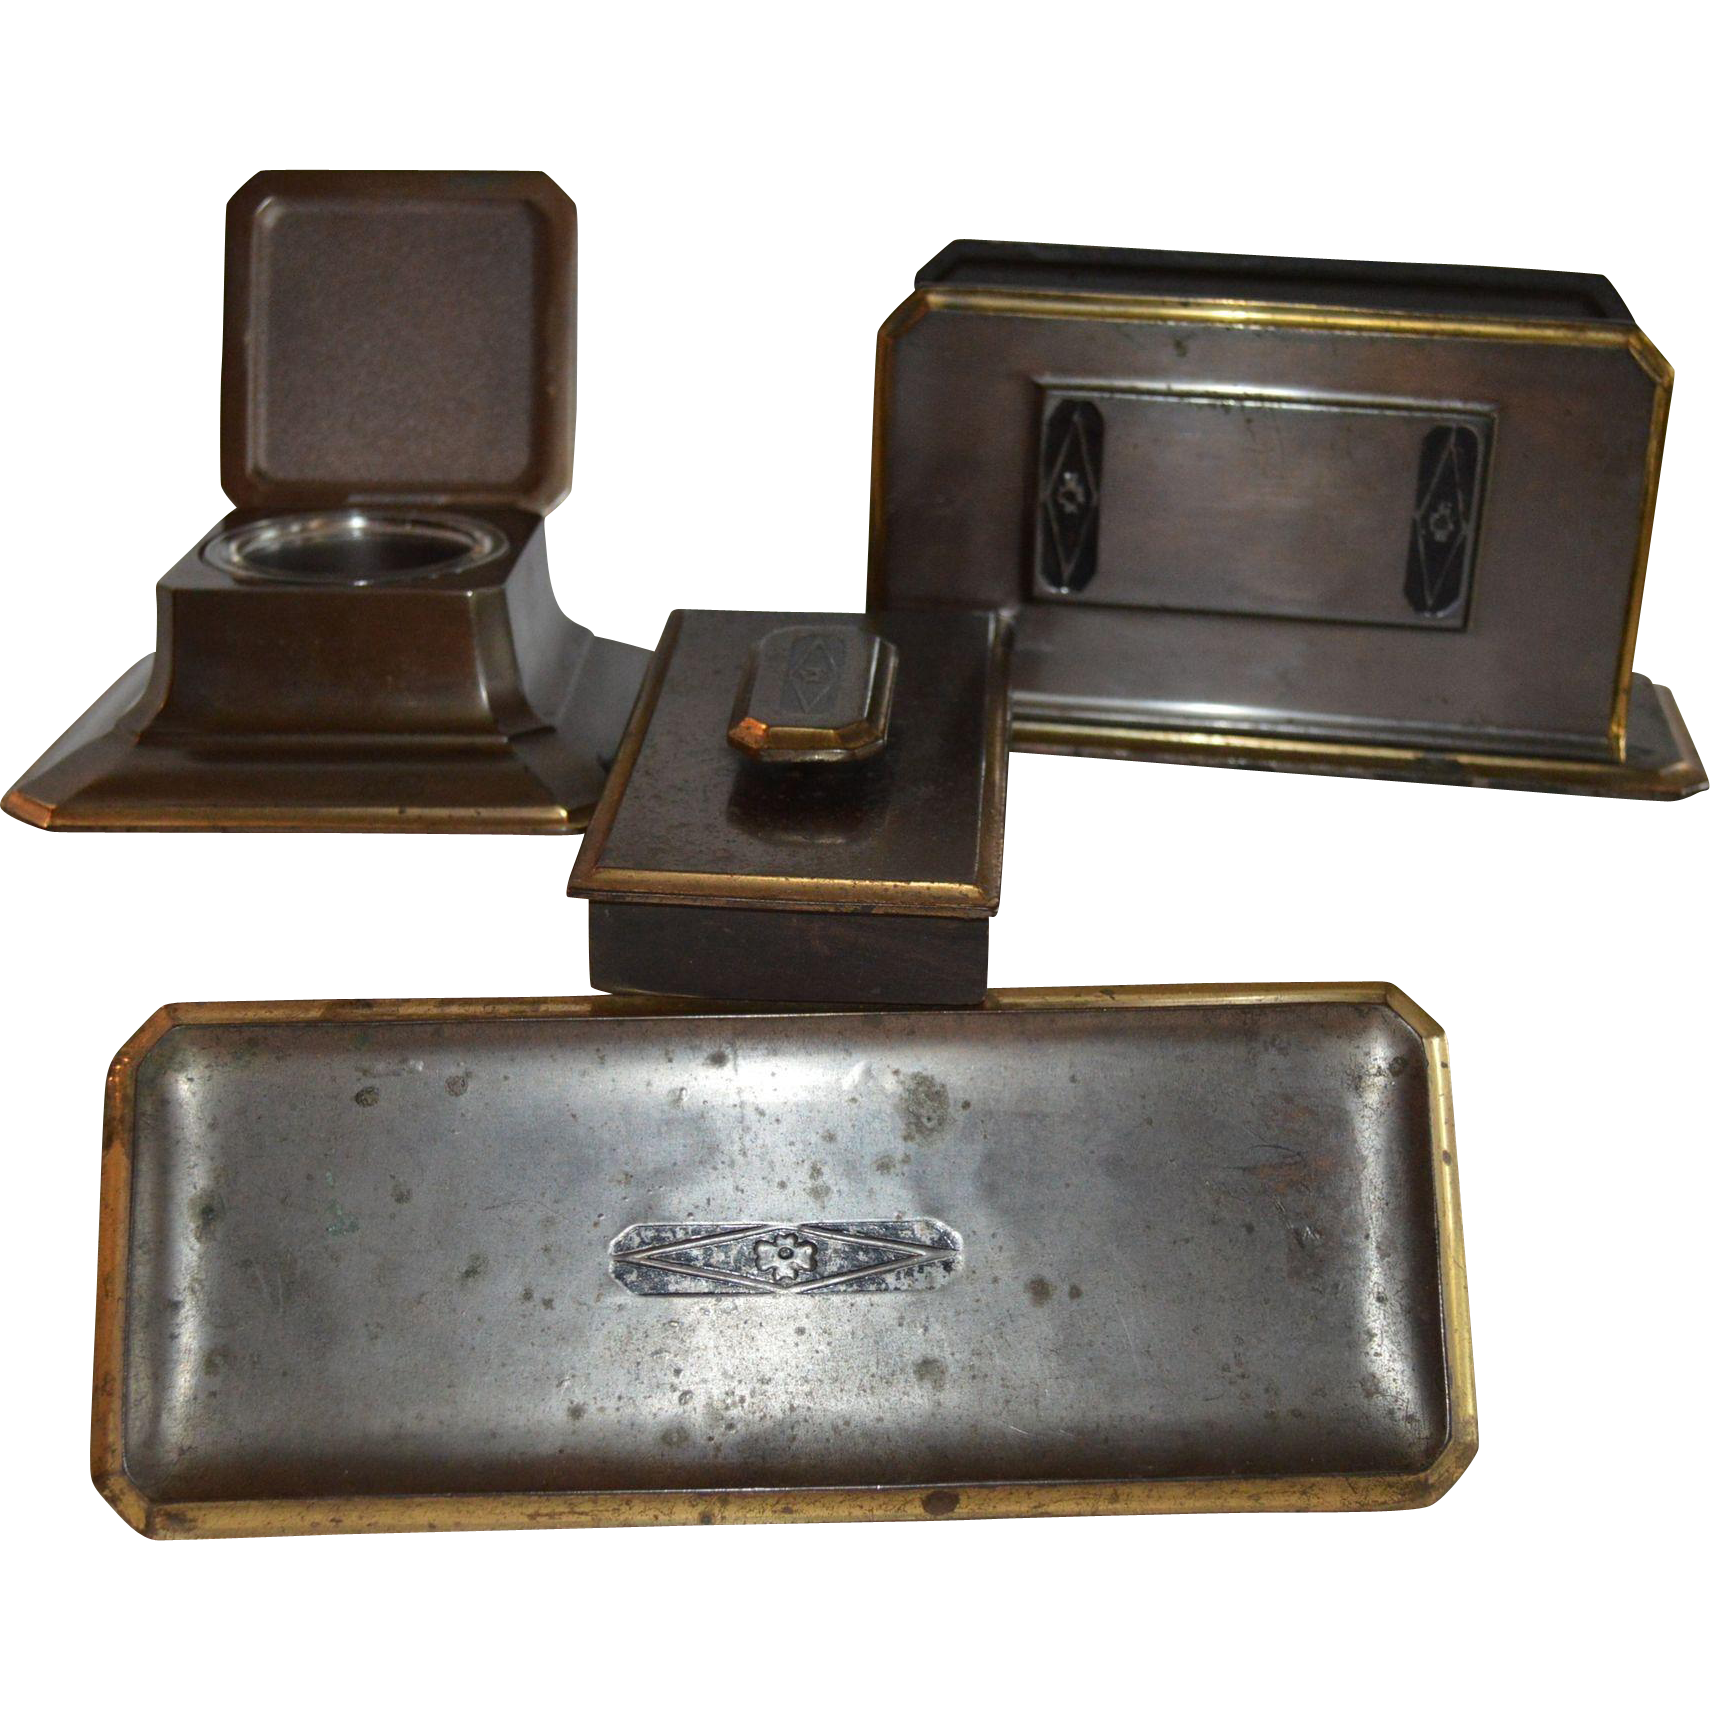 Gorgeous 5 Piece Bronze Desk Set ~  Art Deco ~  Inkwell, Letter Holder, Pen Rest & Blotter  ~ Bradley and Hubbard Meriden CN 1900-1940